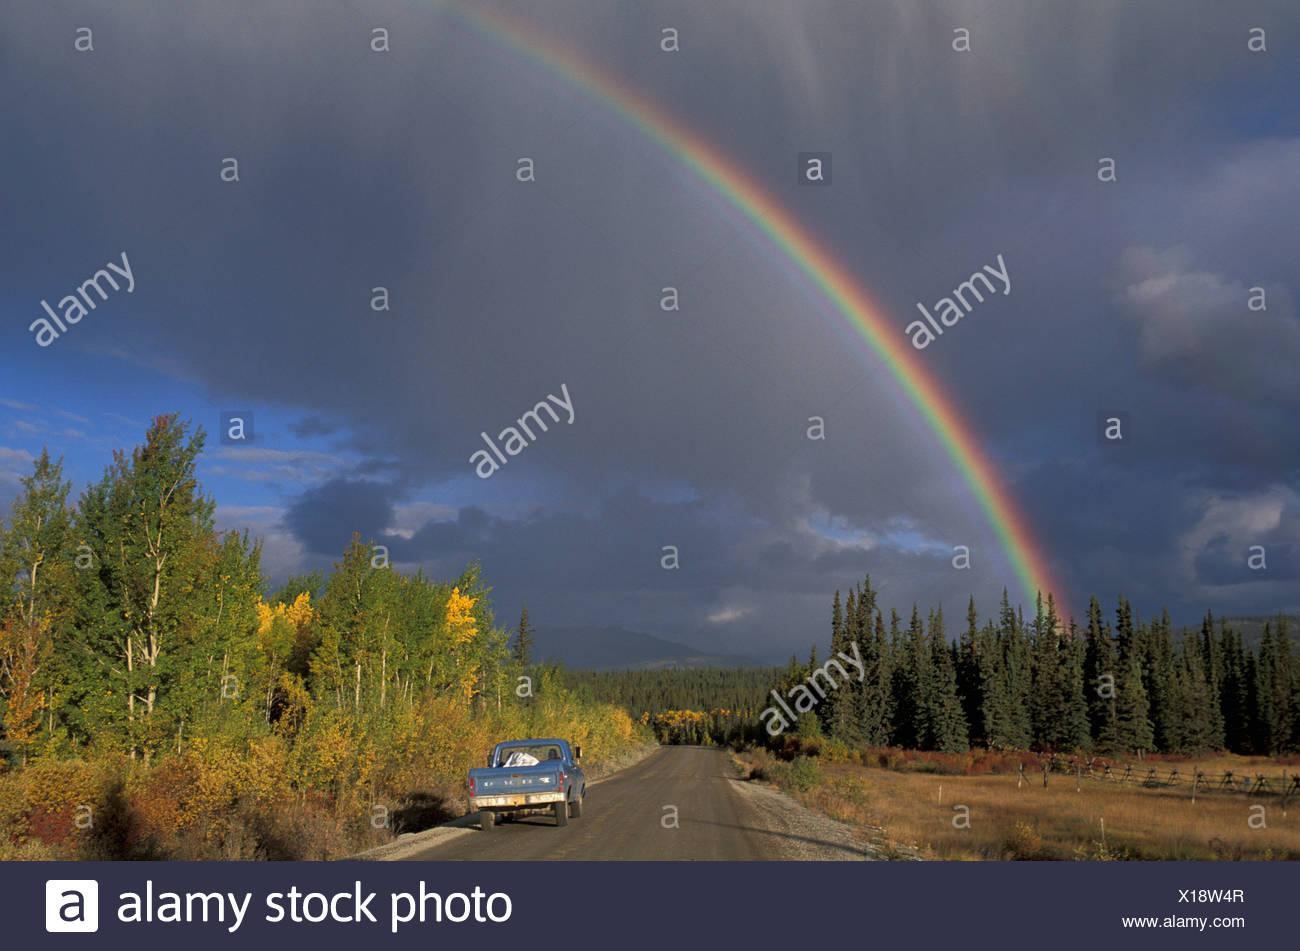 Tagish, Yukon, Canada, stormy sky, rainbow, rainbow, road, blue pickup, rain, low sun - Stock Image